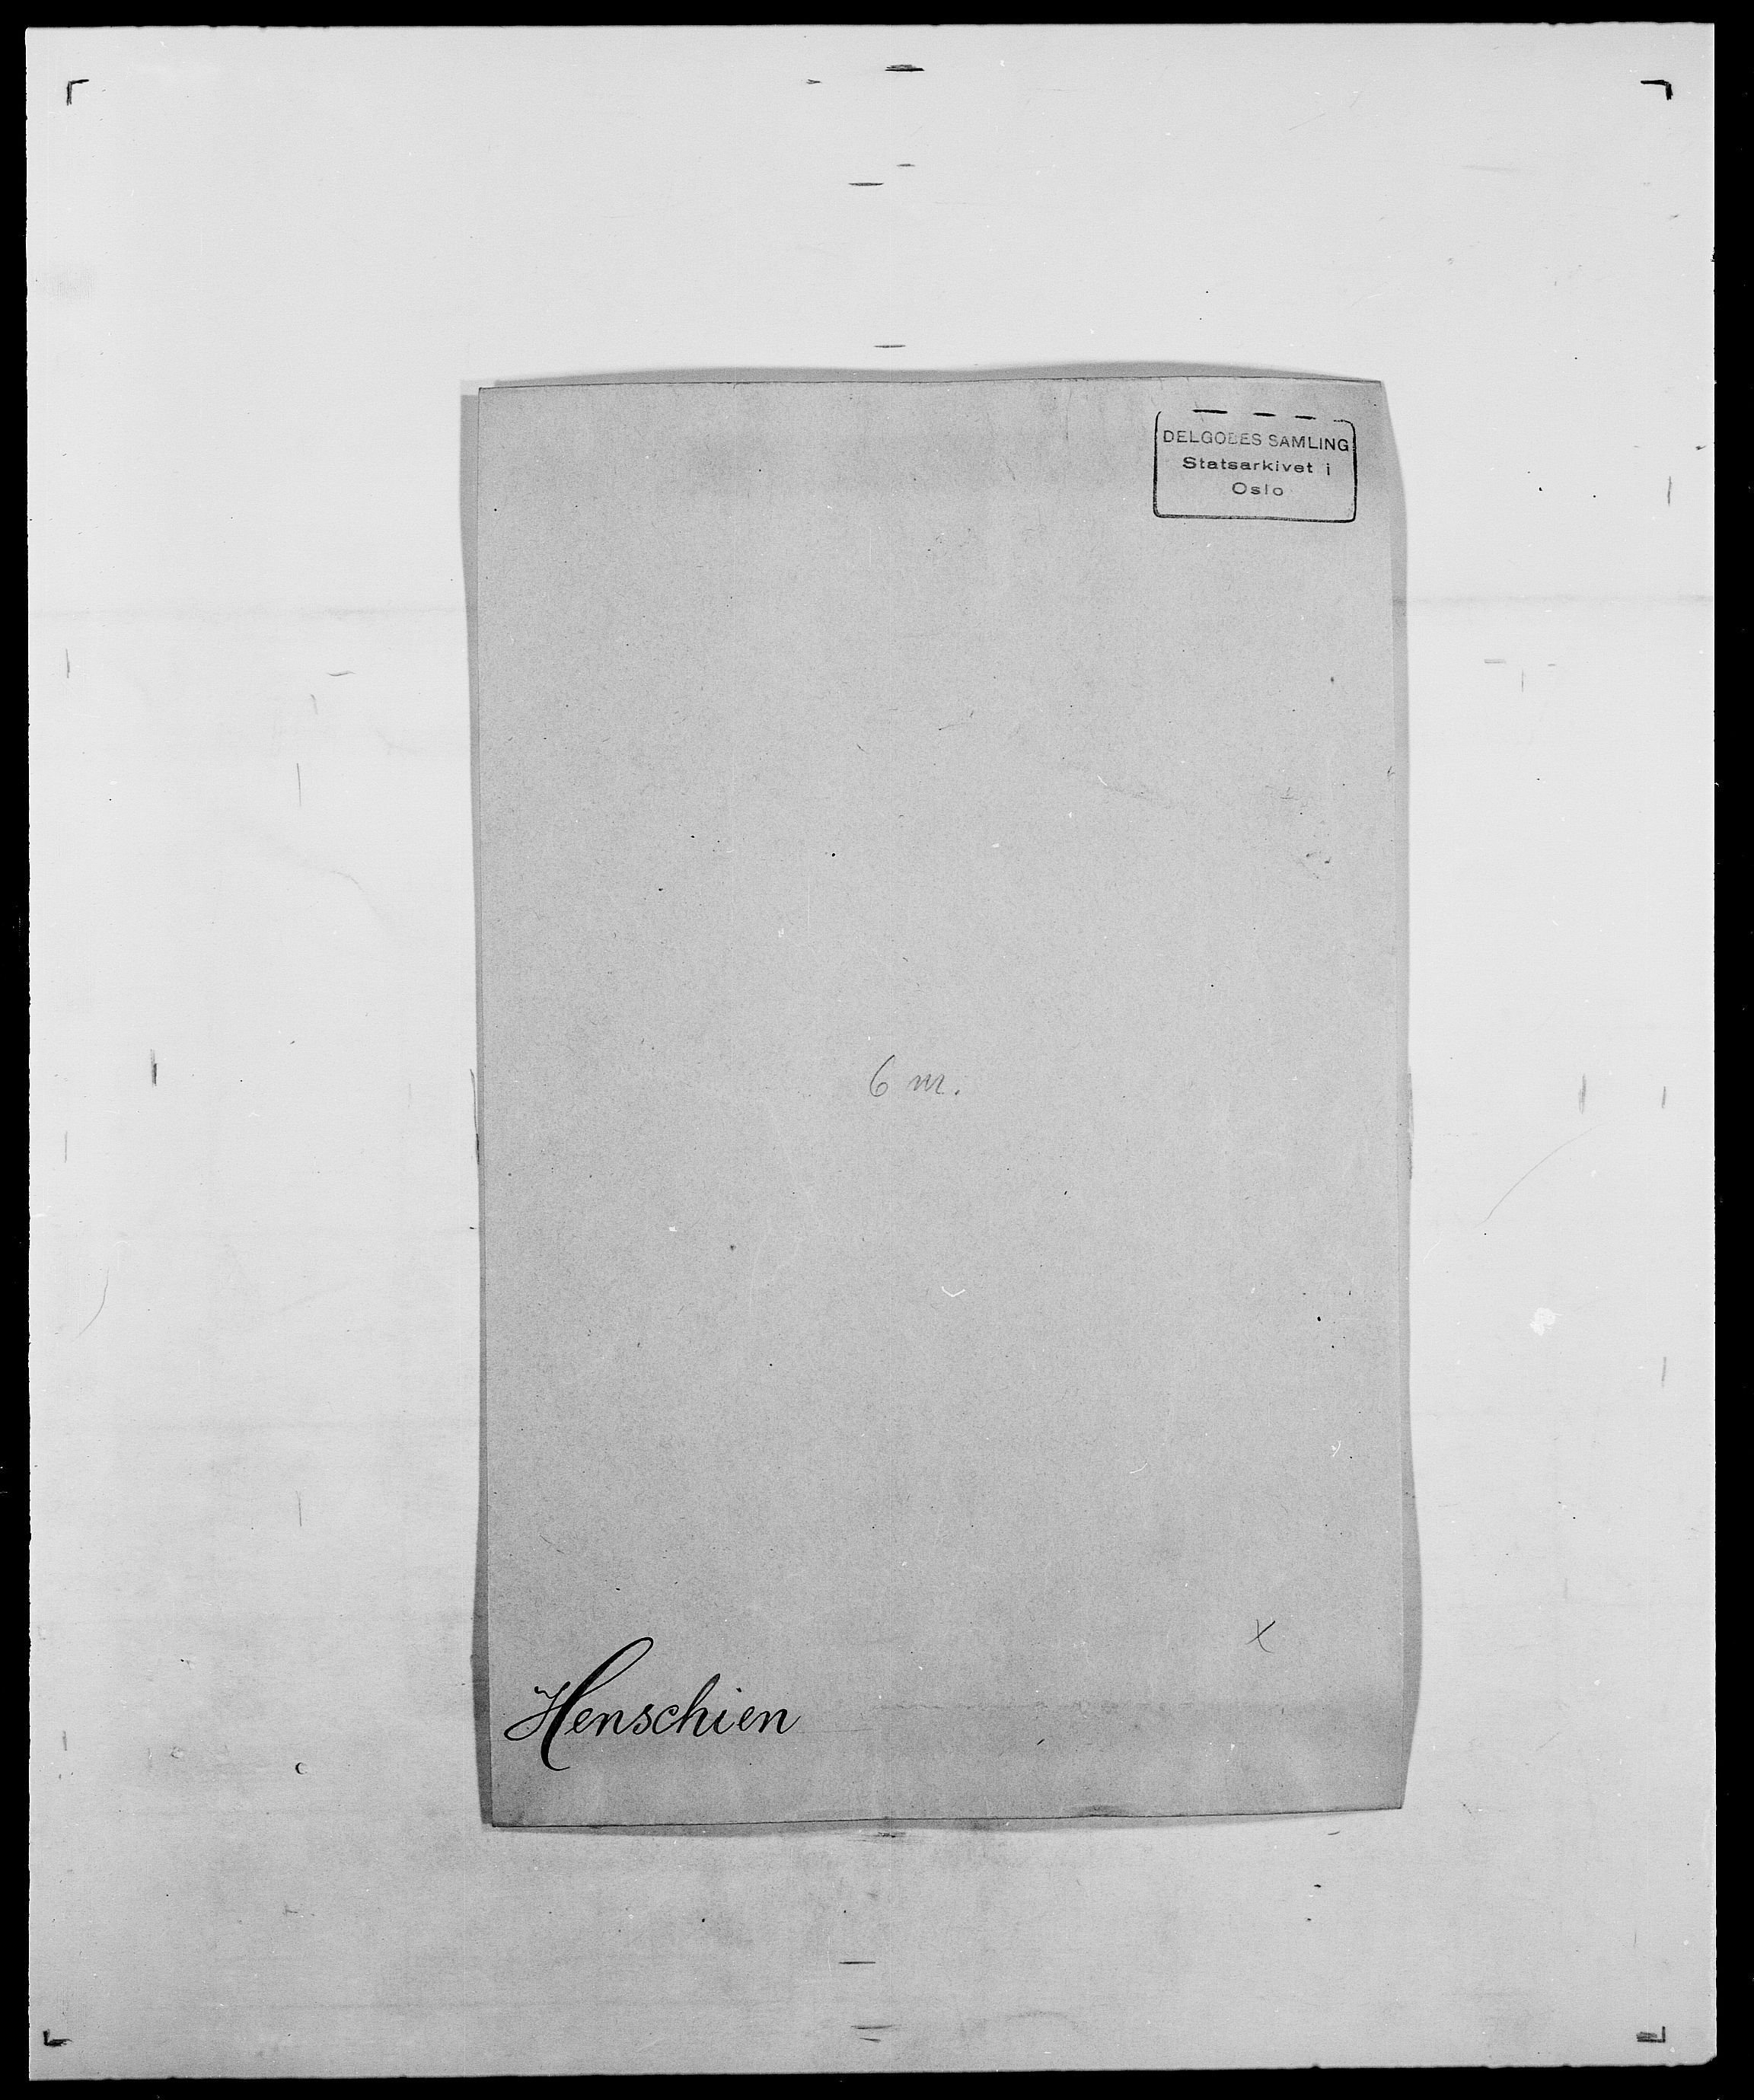 SAO, Delgobe, Charles Antoine - samling, D/Da/L0017: Helander - Hjørne, s. 208